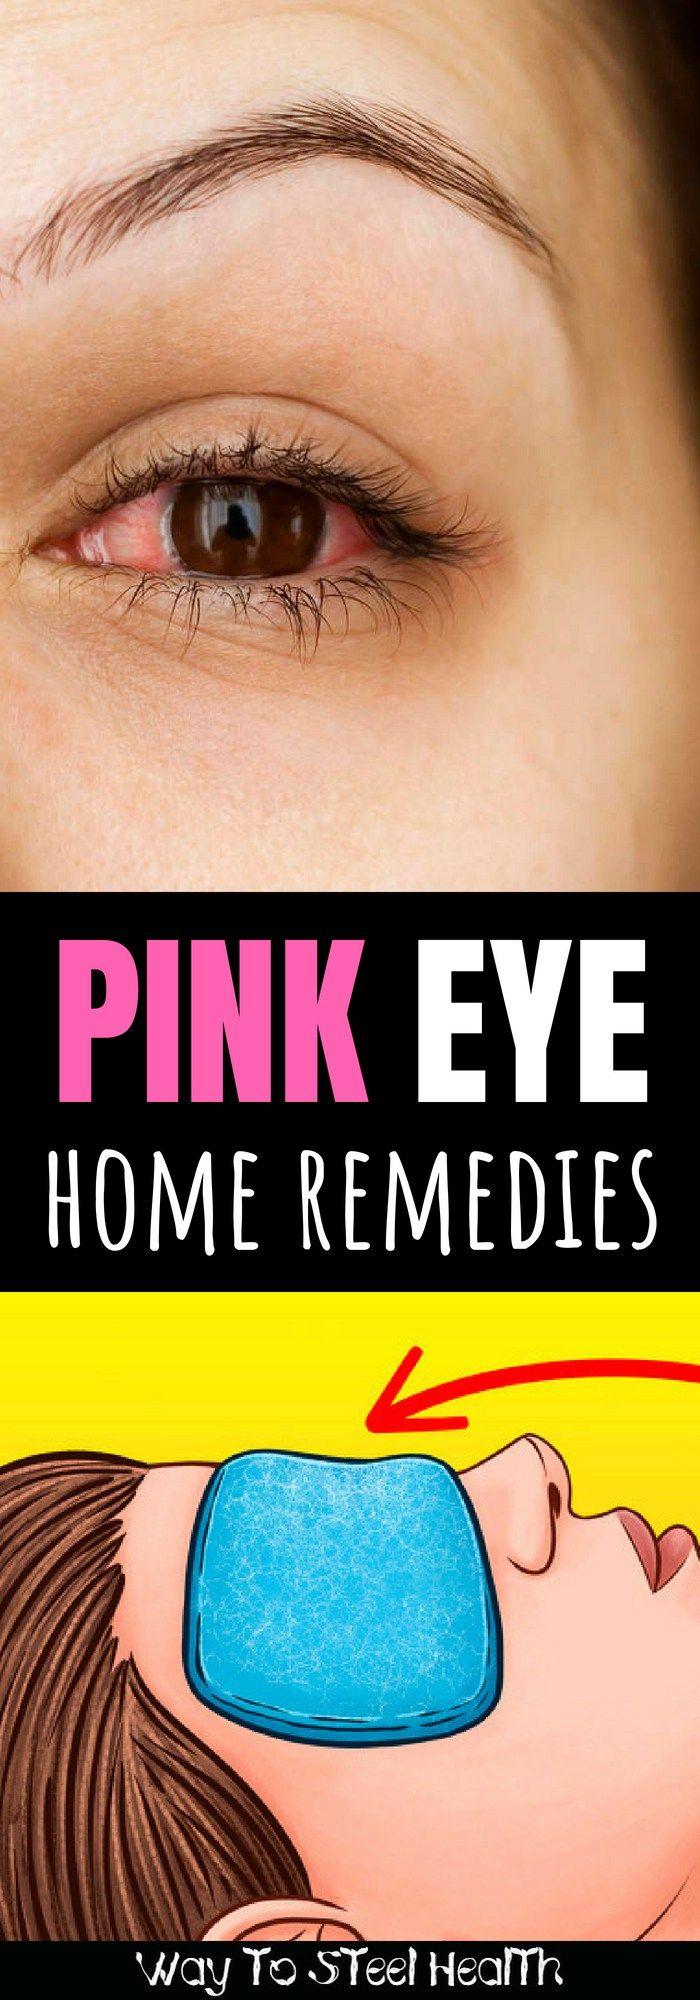 dc4f10aaa83928771c762a1a52e22b67 - How To Get Rid Of Eye Strain Home Remedies